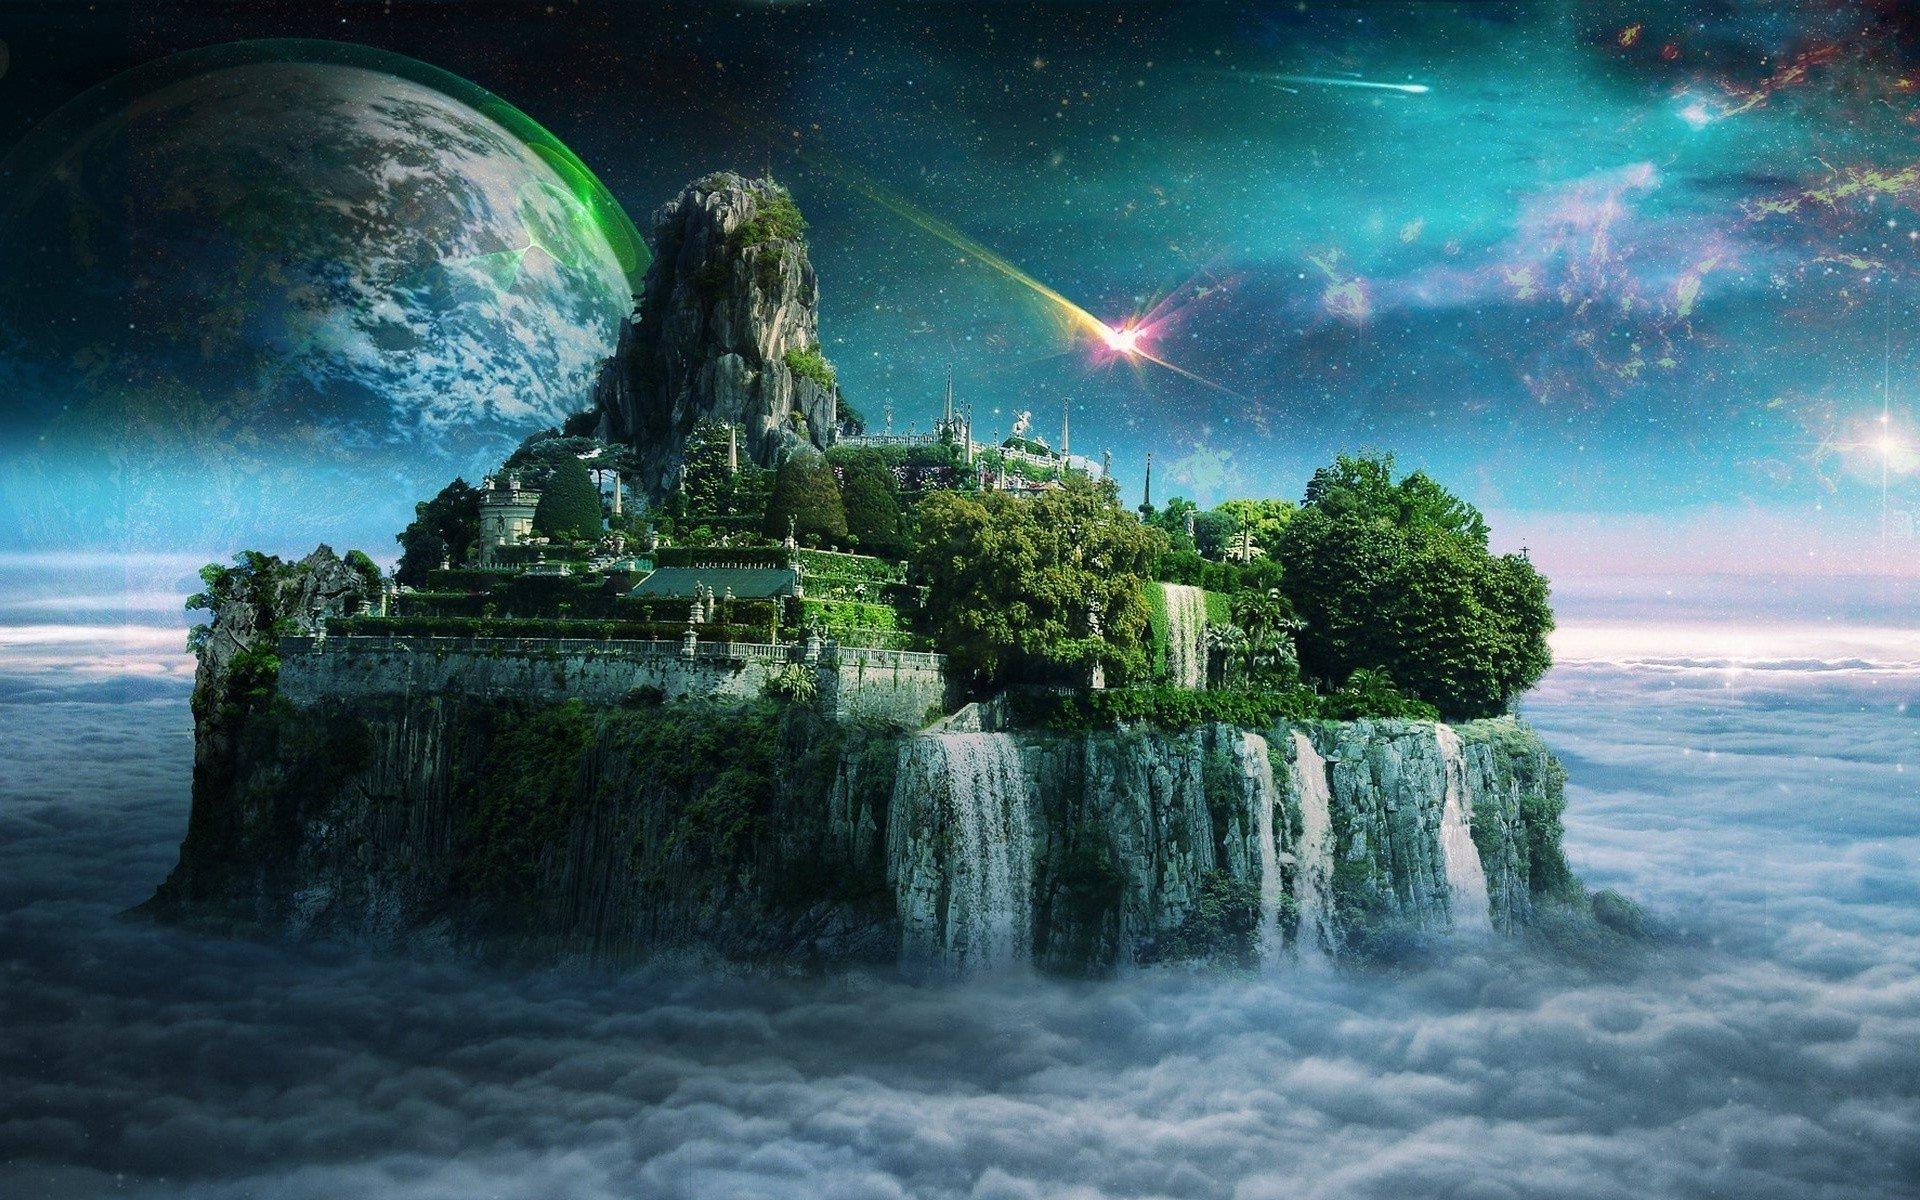 Artistic - Fantasy  Floating Island Artistic Landscape Moon Cloud Planet Wallpaper